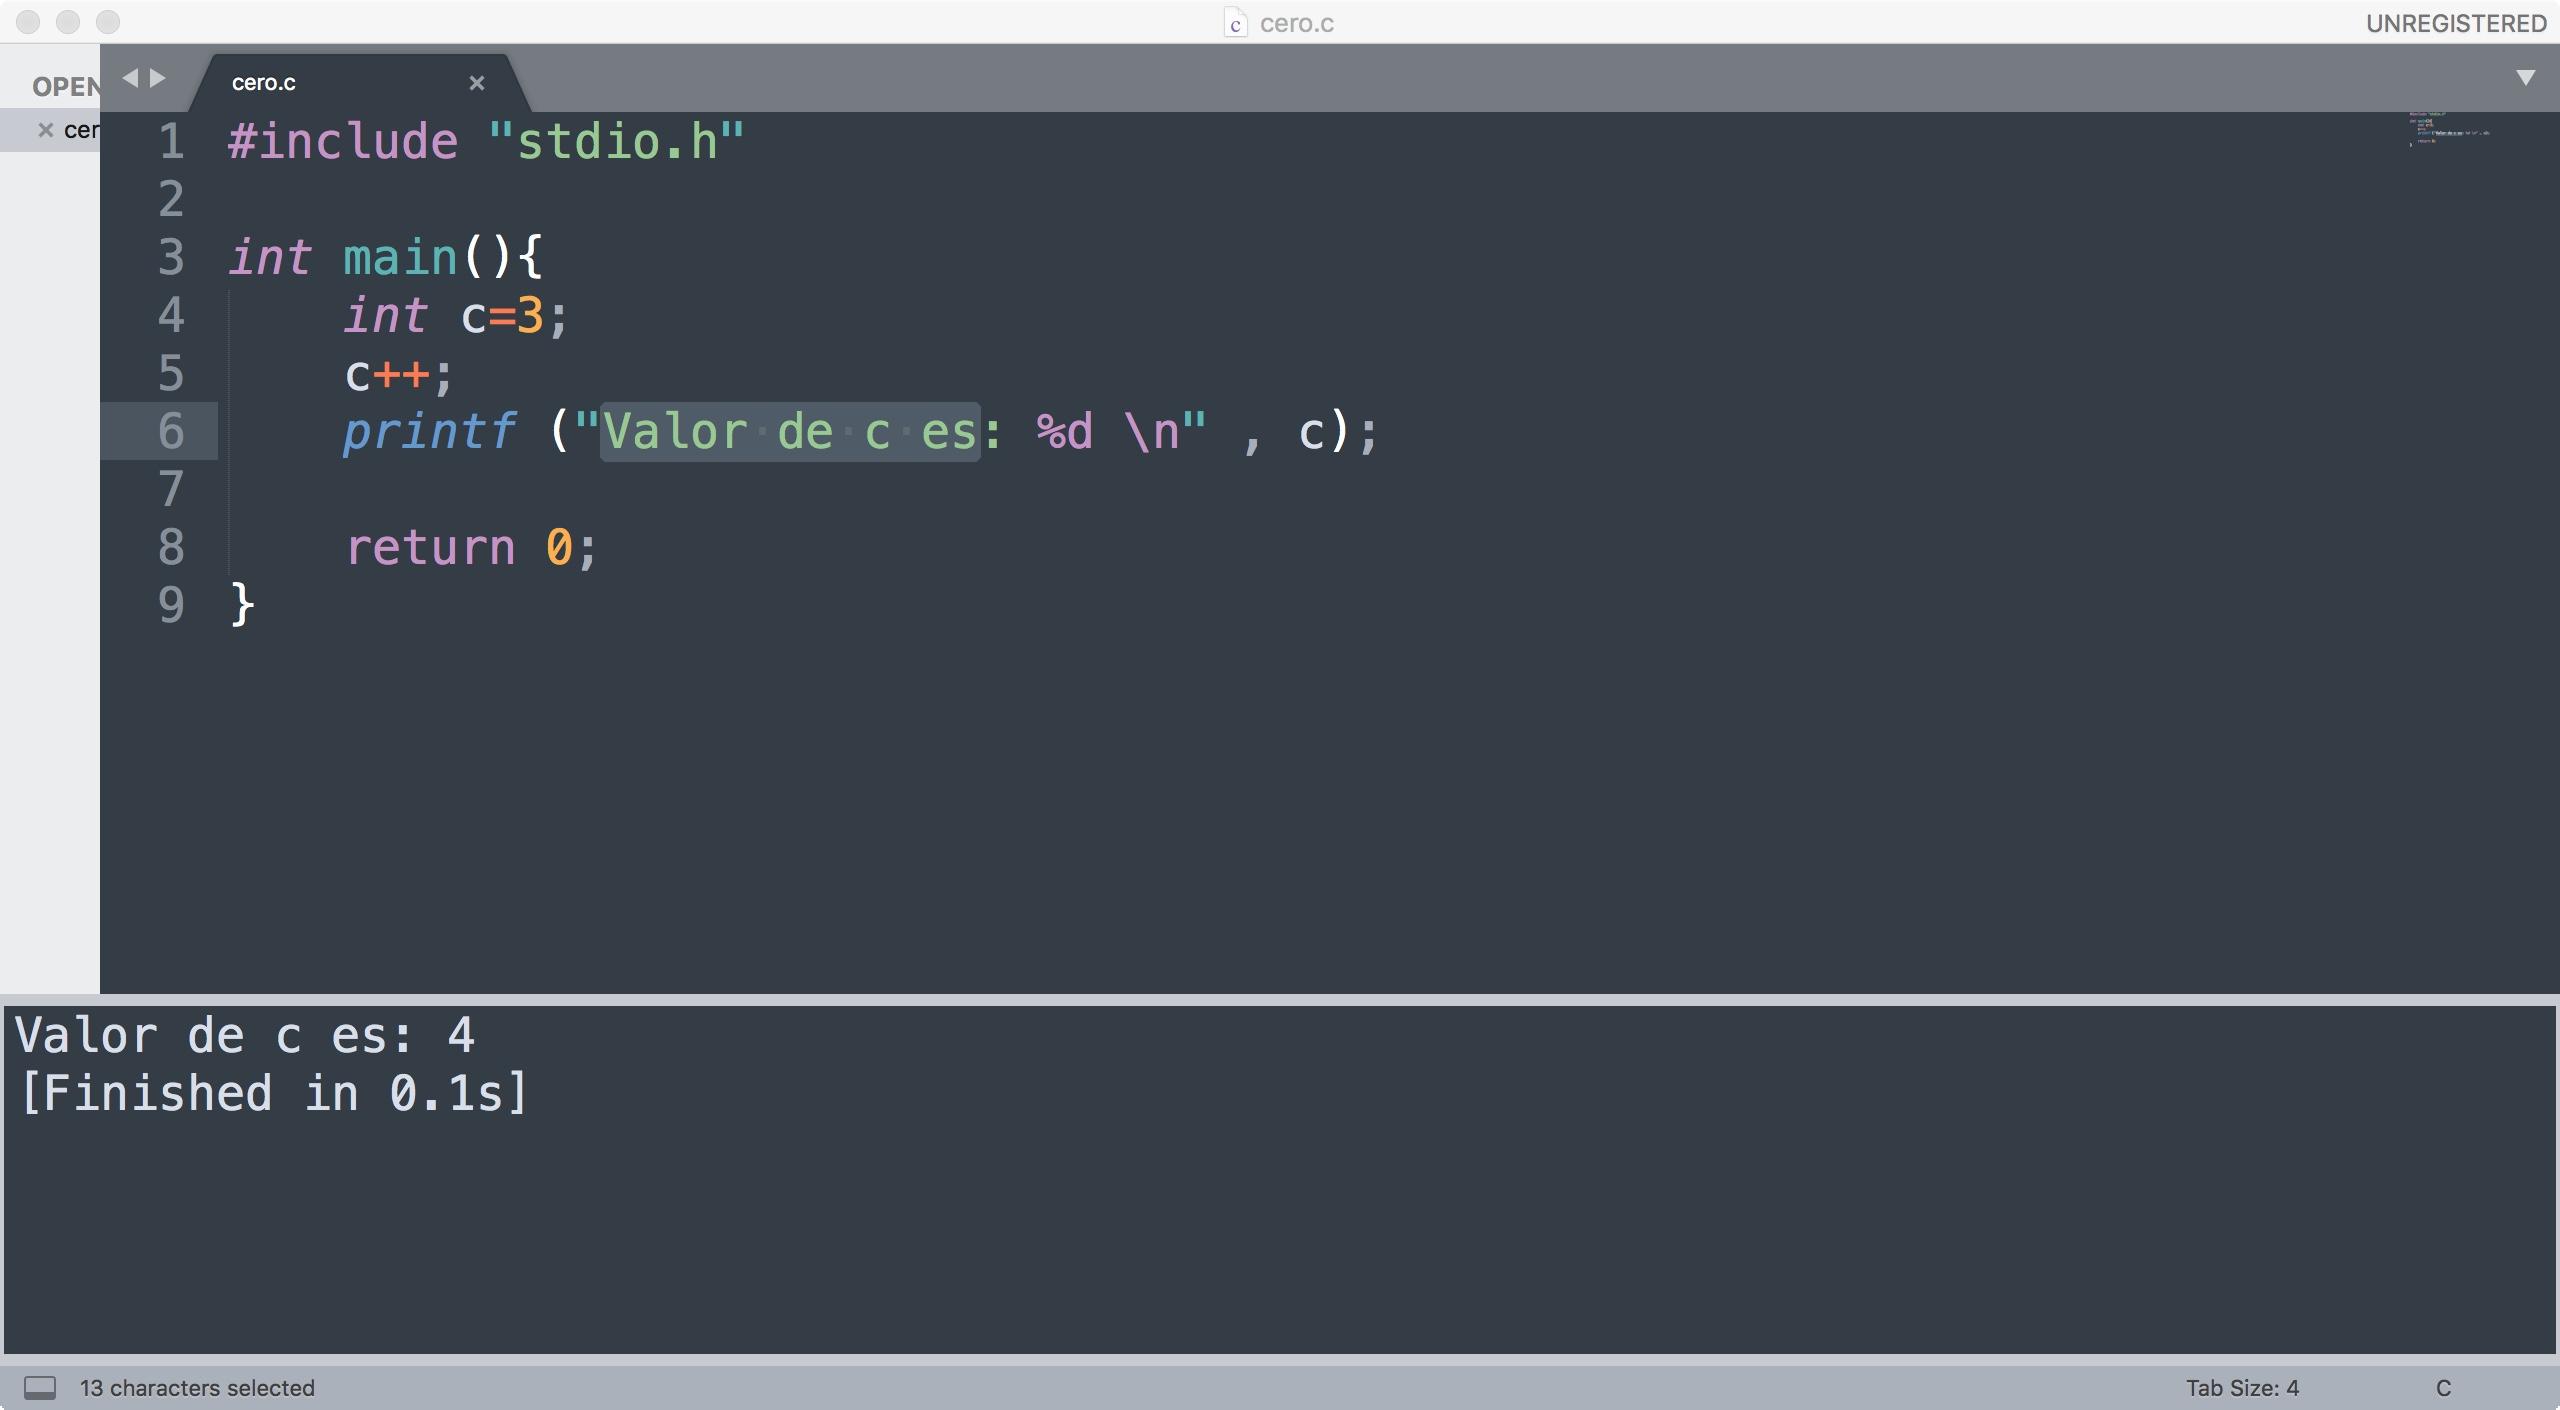 Compilar y Ejecutar C desde Sublime Text